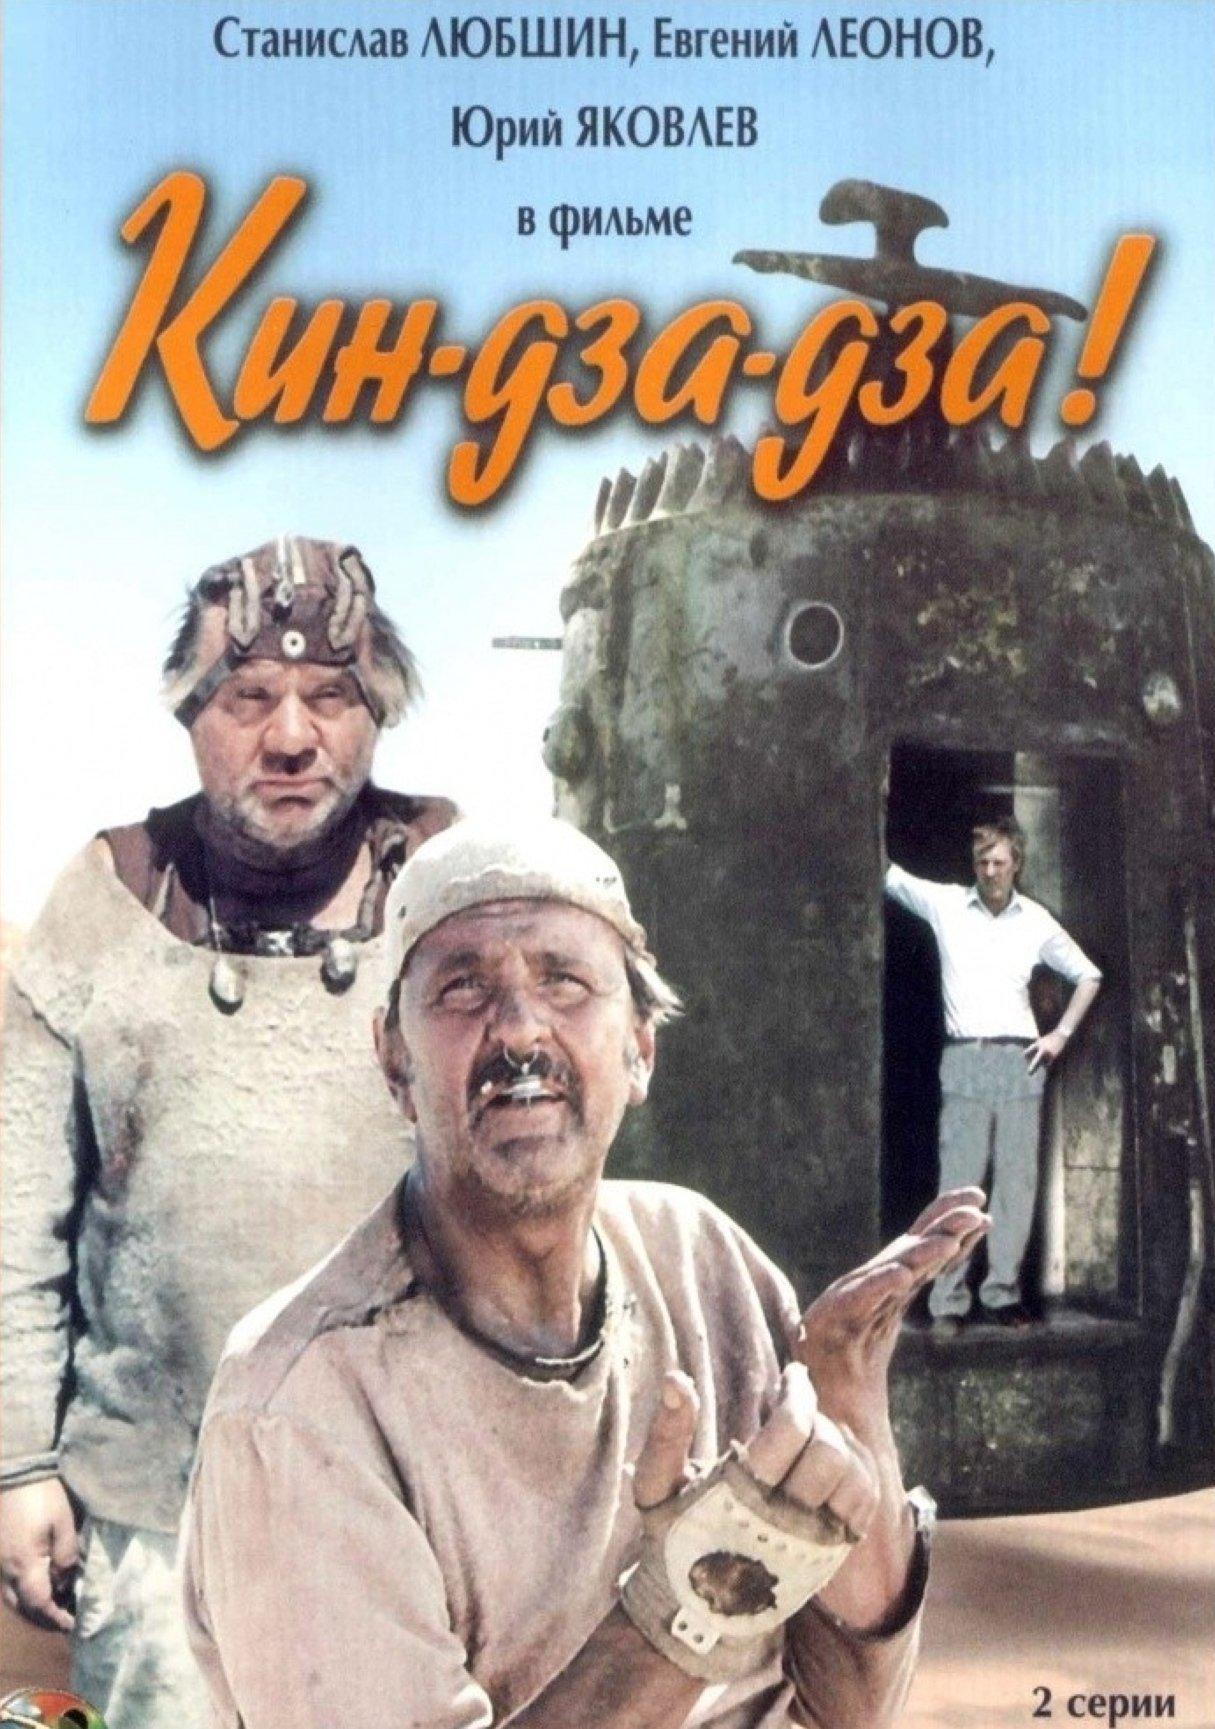 Картинки по запросу Кин-дза-дза!